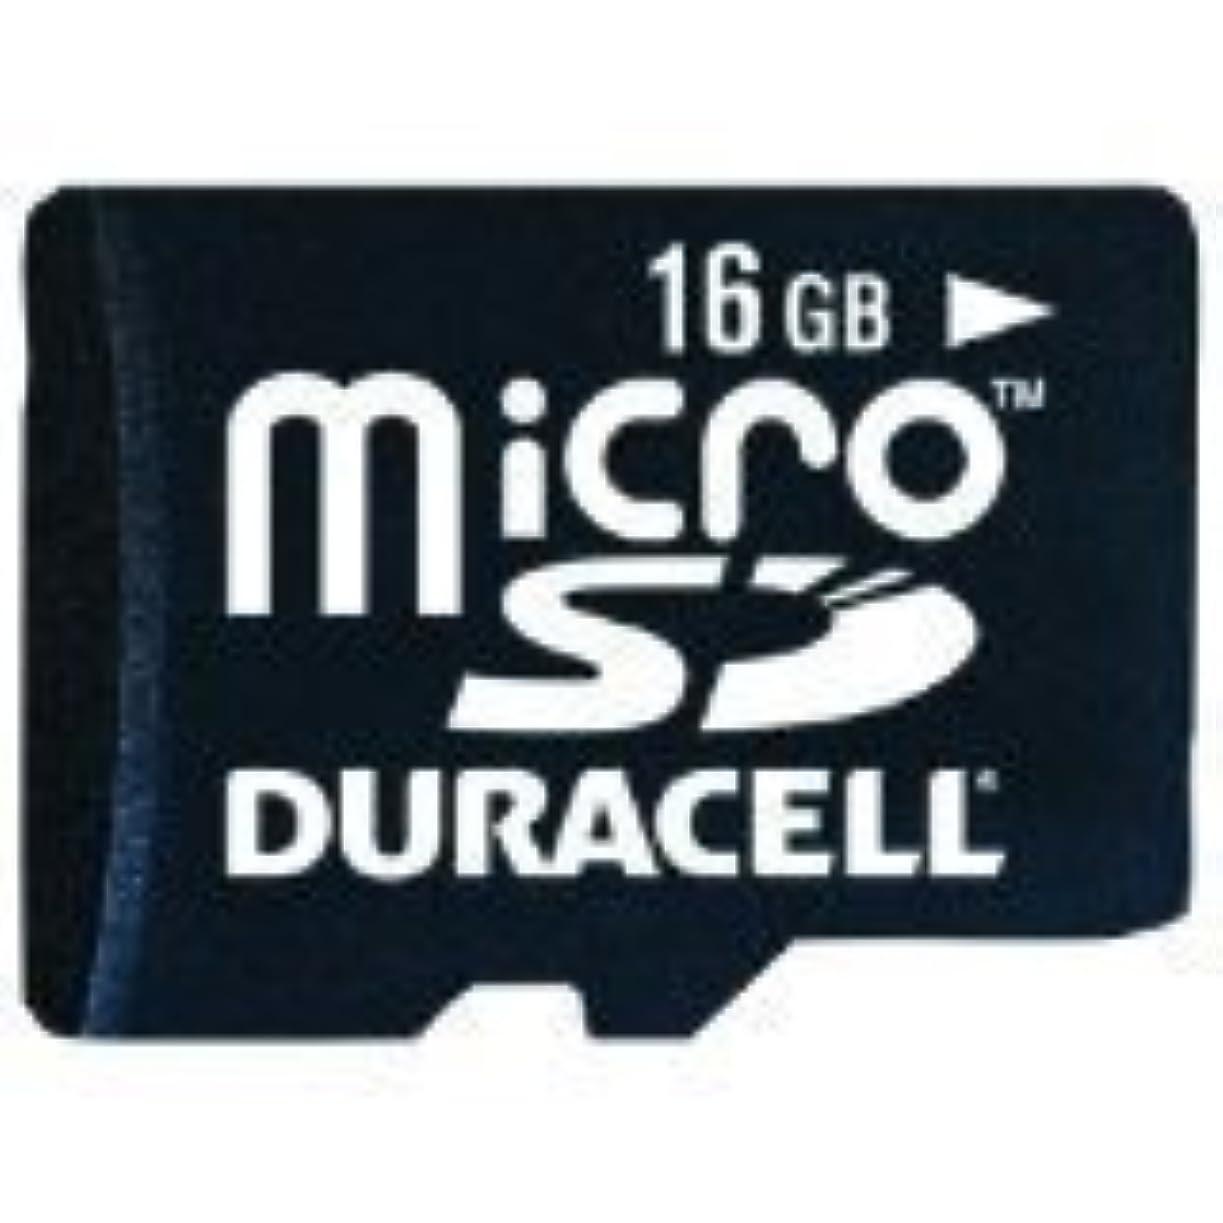 大脳前奏曲舗装Duracell 16 GB Micro Secure Digital Card with Universal Adapter (DEMDU3IN116GC) [並行輸入品]